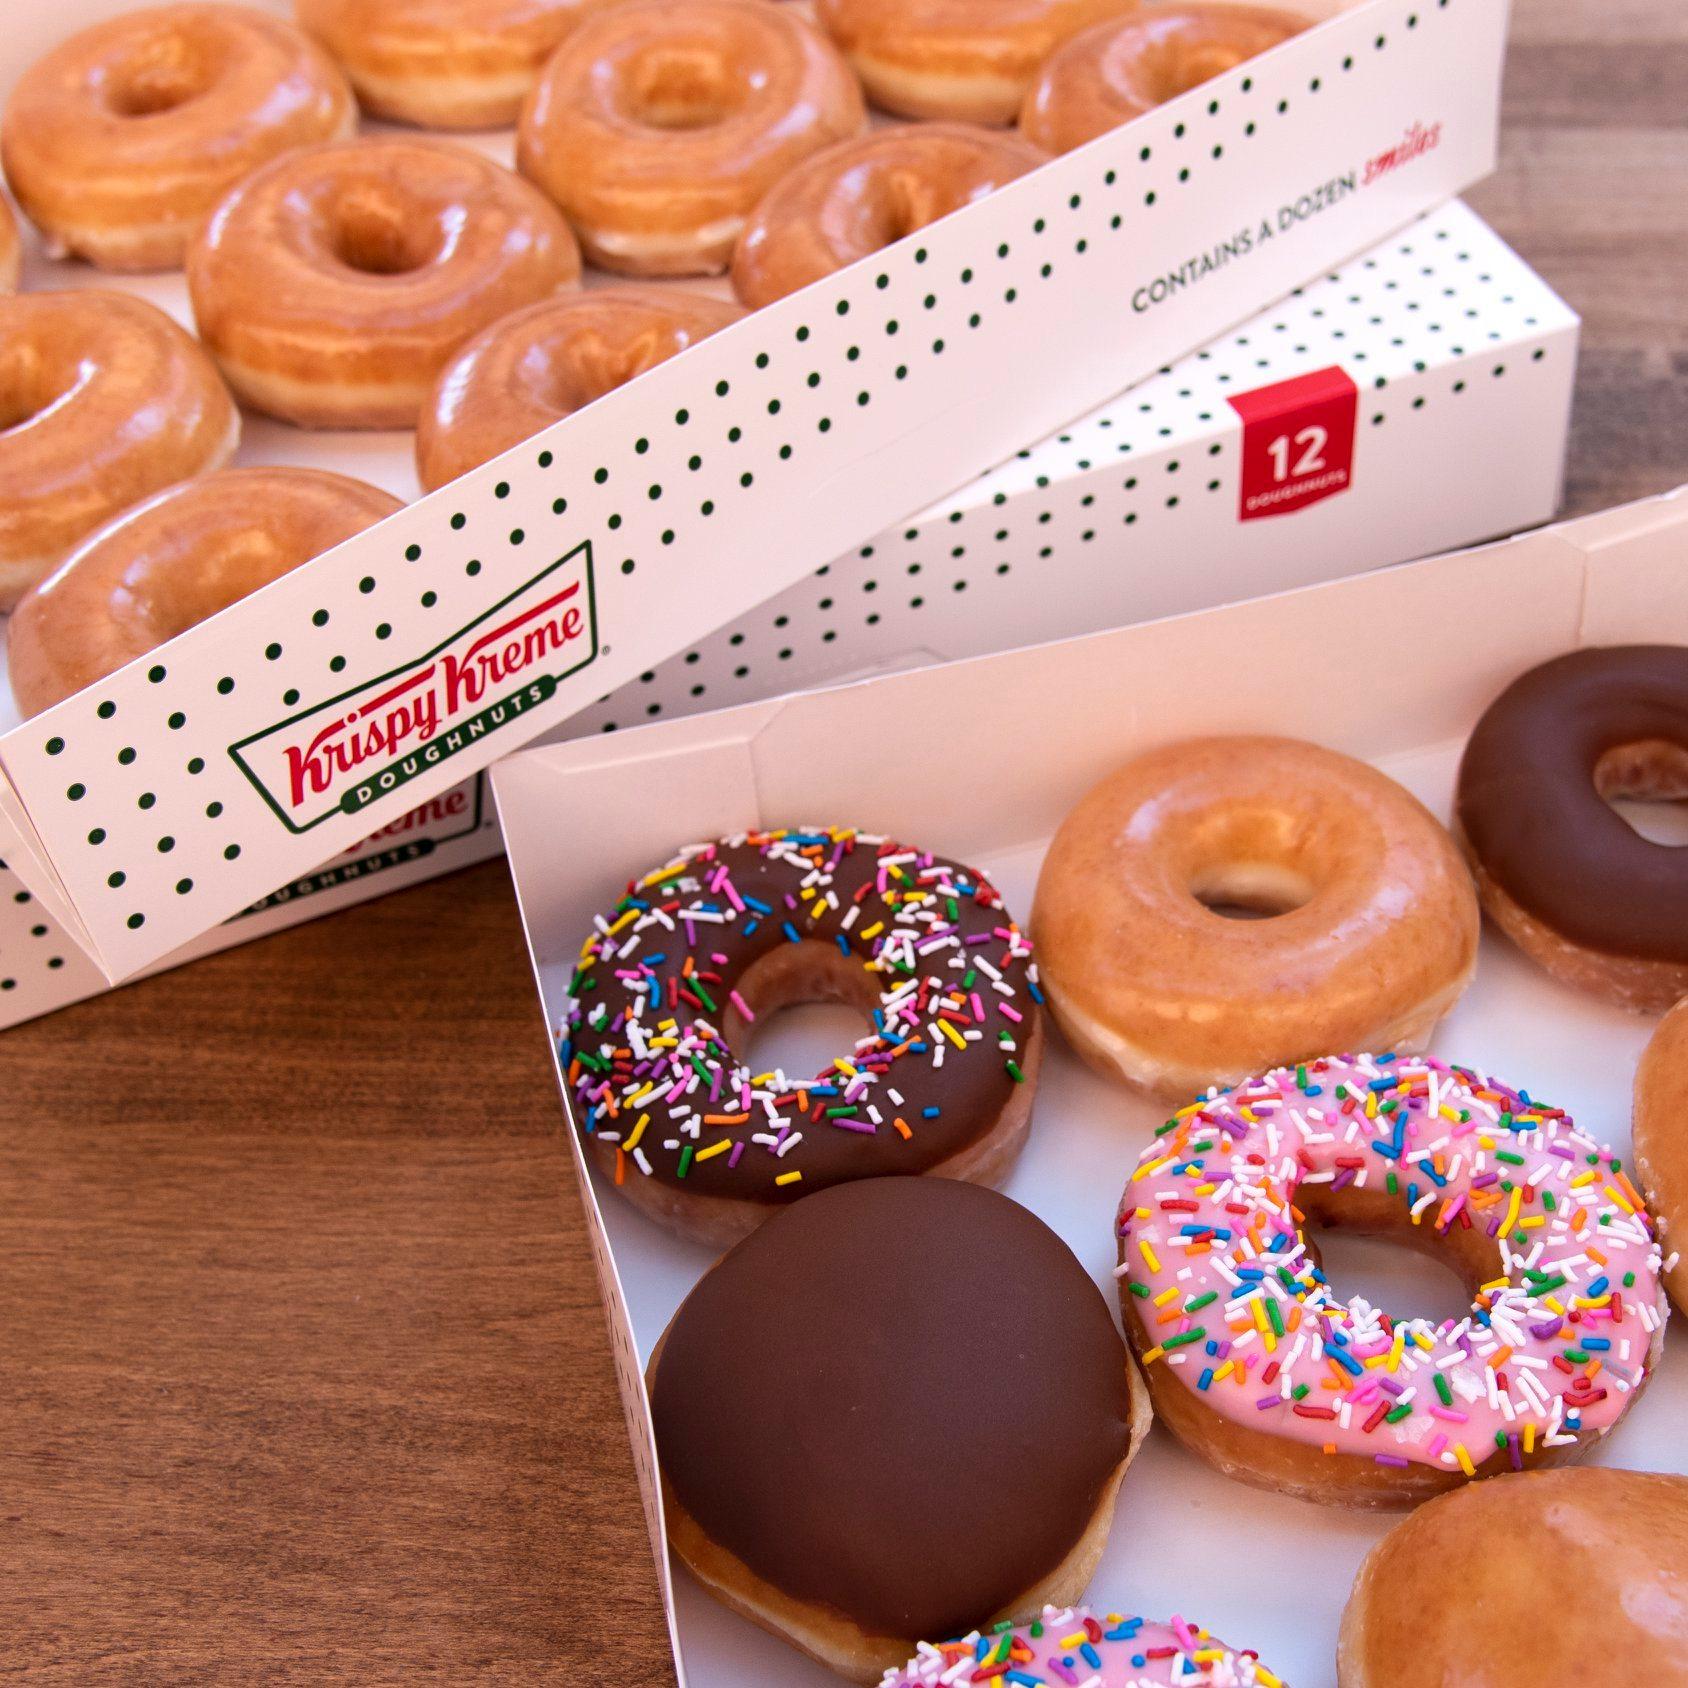 Free Krispy Kreme Doughtnut